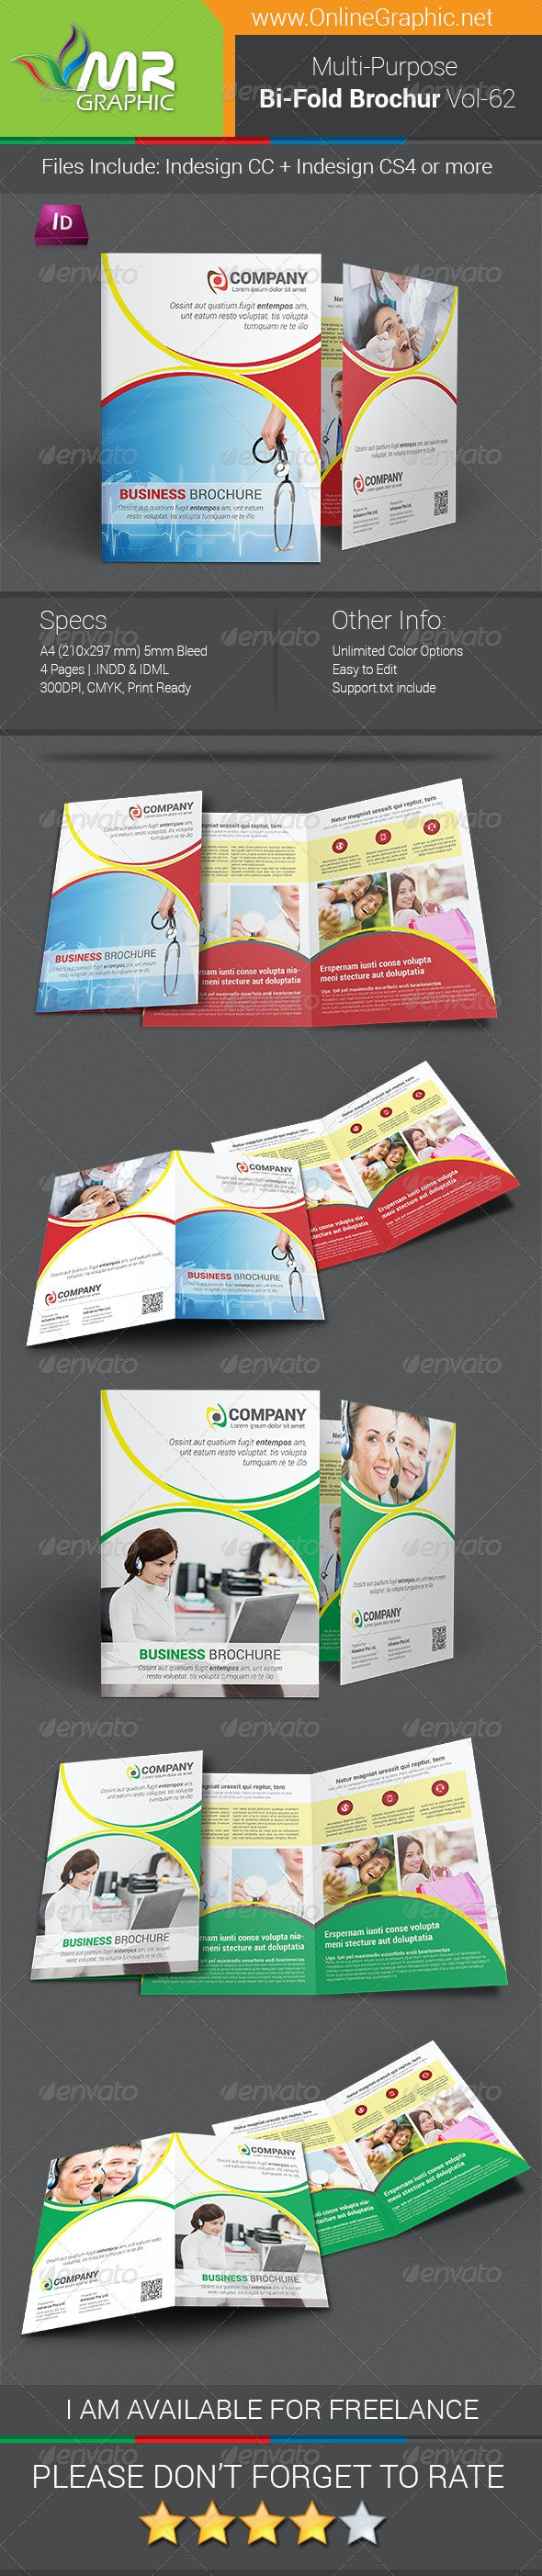 Multipurpose Bifold Brochure Template Vol-62 - Corporate Brochures